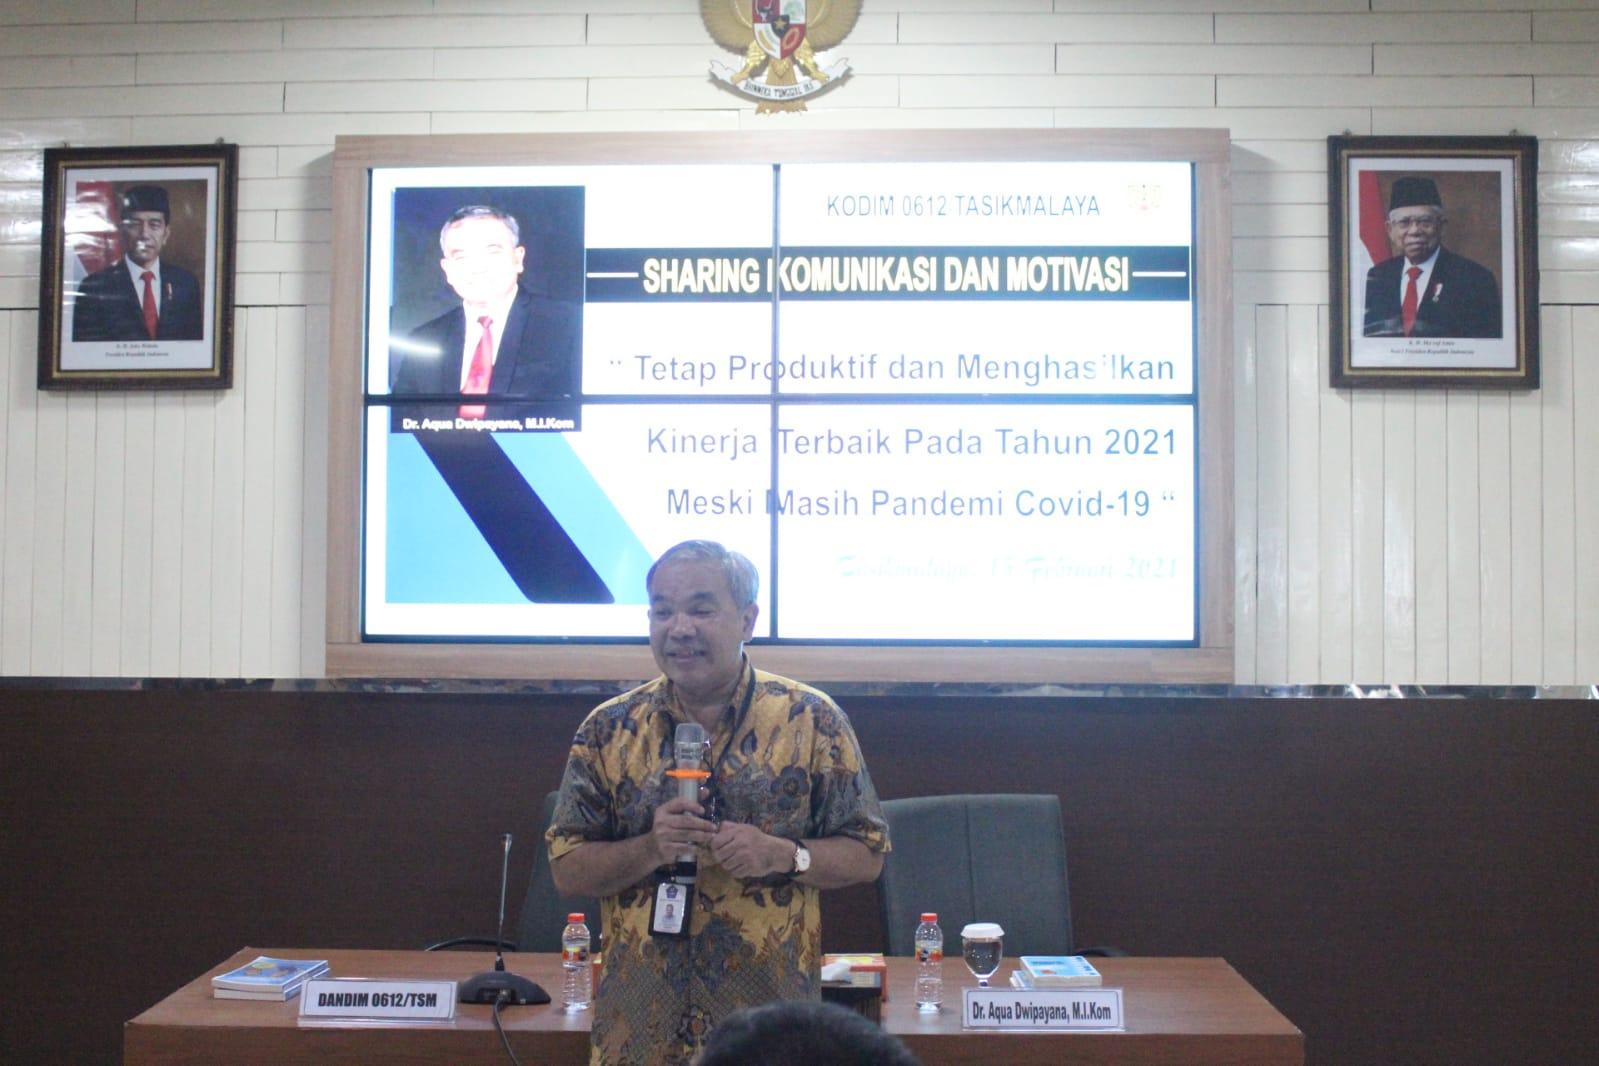 Pakar Komunikasi dan Motivator Nasional Dr Aqua Dwipayana saat memberikan materi kepada peserta Sharing Komunikasi dan Motivasi di Tasikmalaya, Jawa Barat. (Foto:Dok/Tugu Jatim)